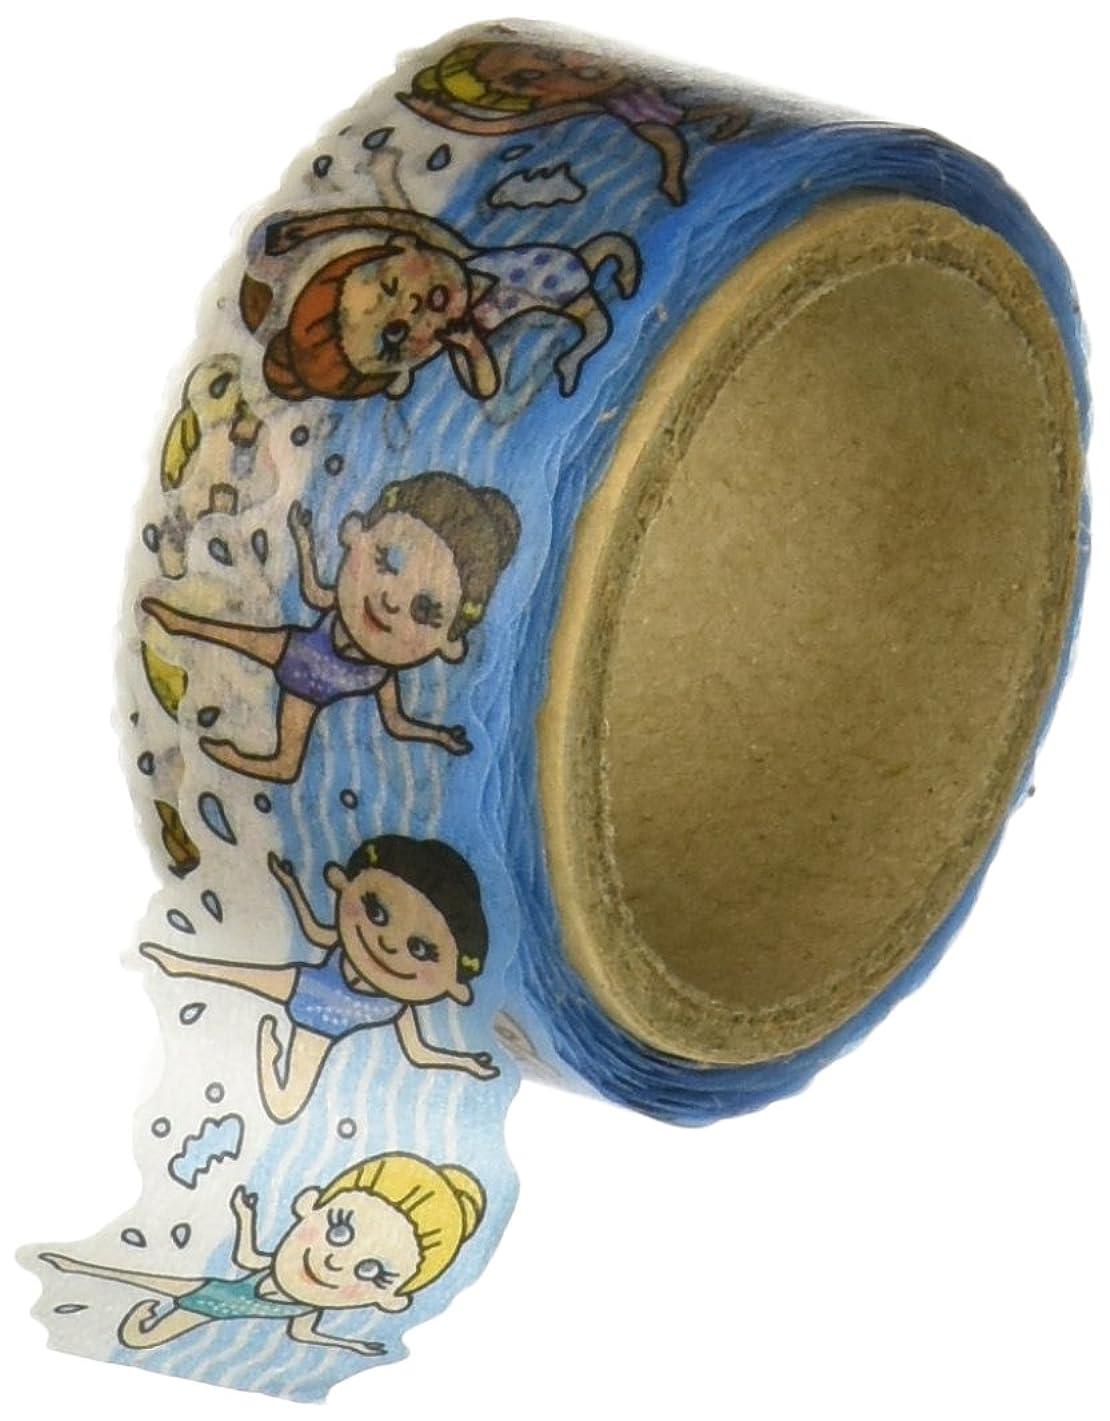 Roundtop Designer's Washi Masking Tape 20mm x 5m, Tips Character Series 4, Synchronized Swimming (RT-MK-019)